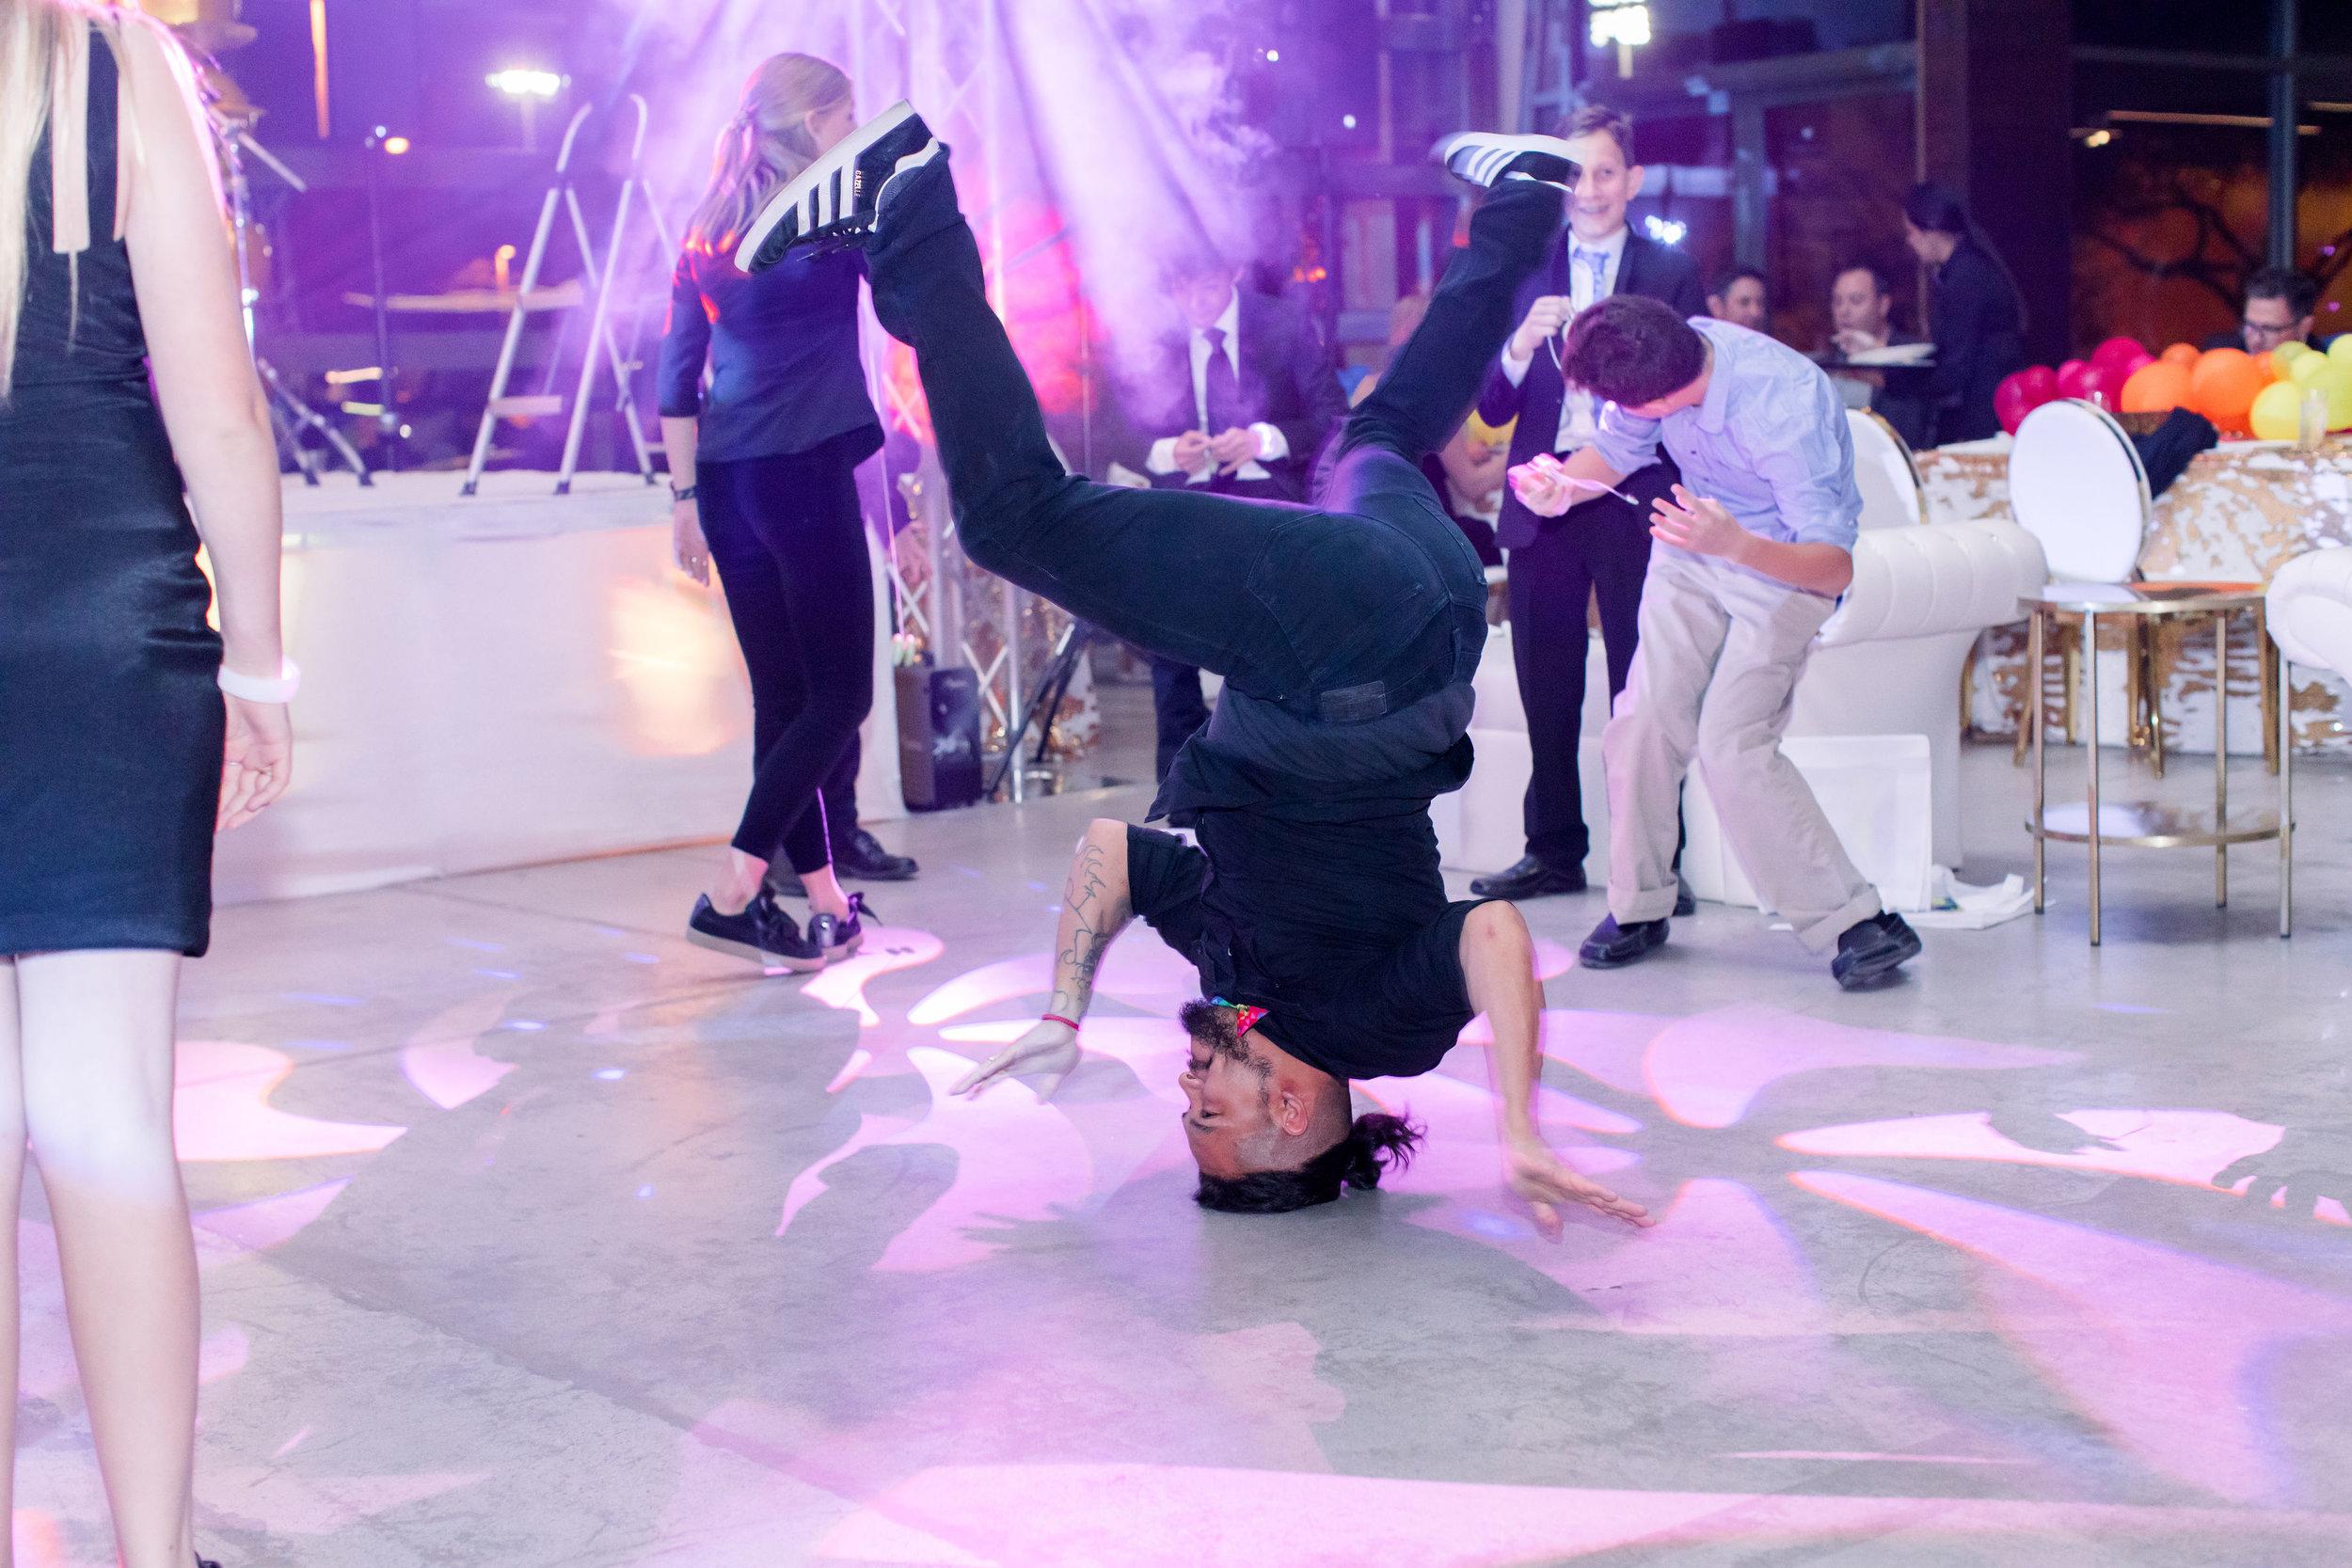 61 rainbow bat mitzvah party head spin dancer dance party Life Design Events photos by Stephanie Heymann Photography.jpg